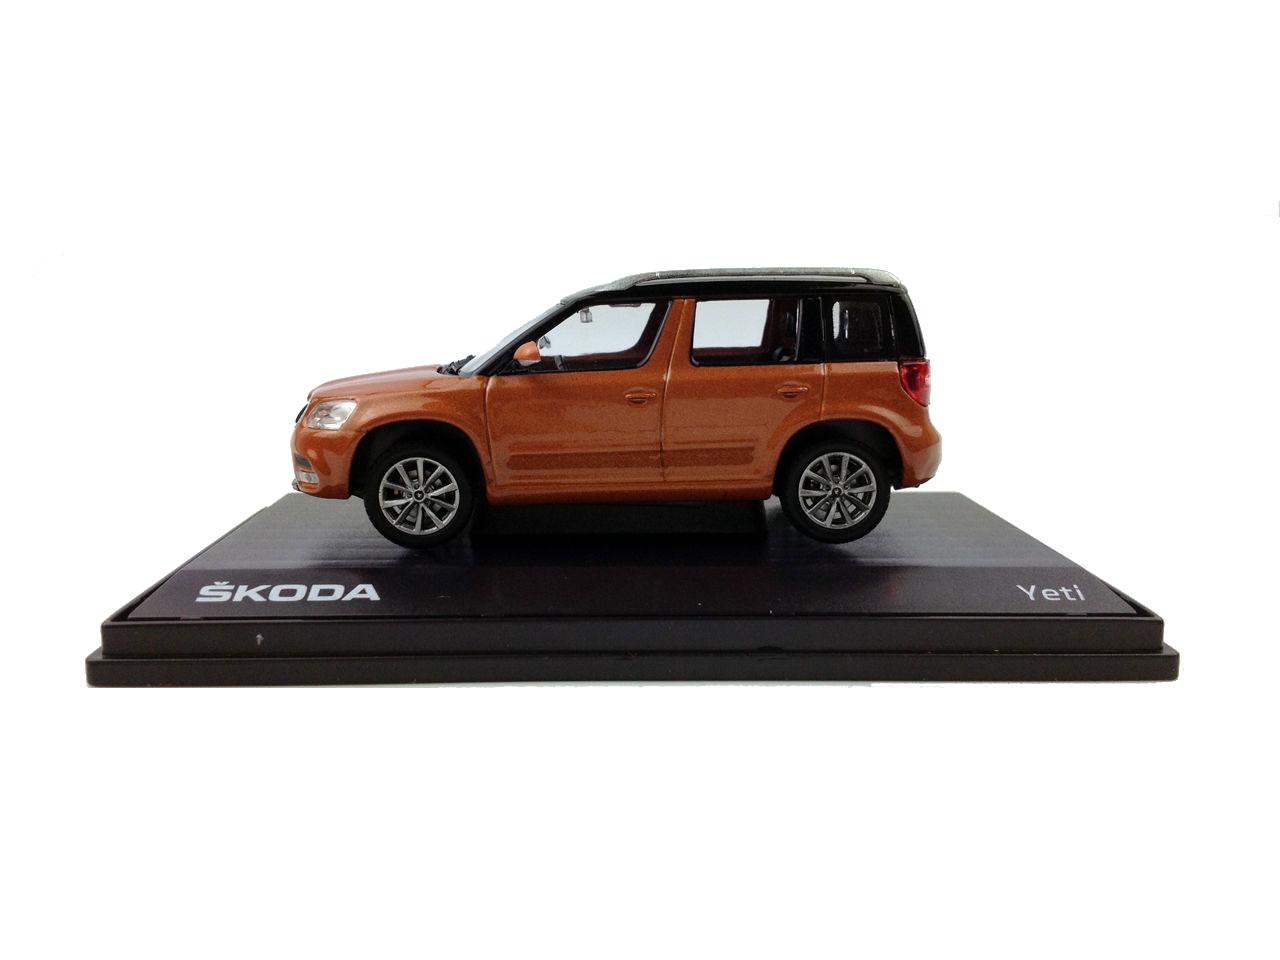 Skoda Yeti 1/43 Scale Diecast Model Car 7